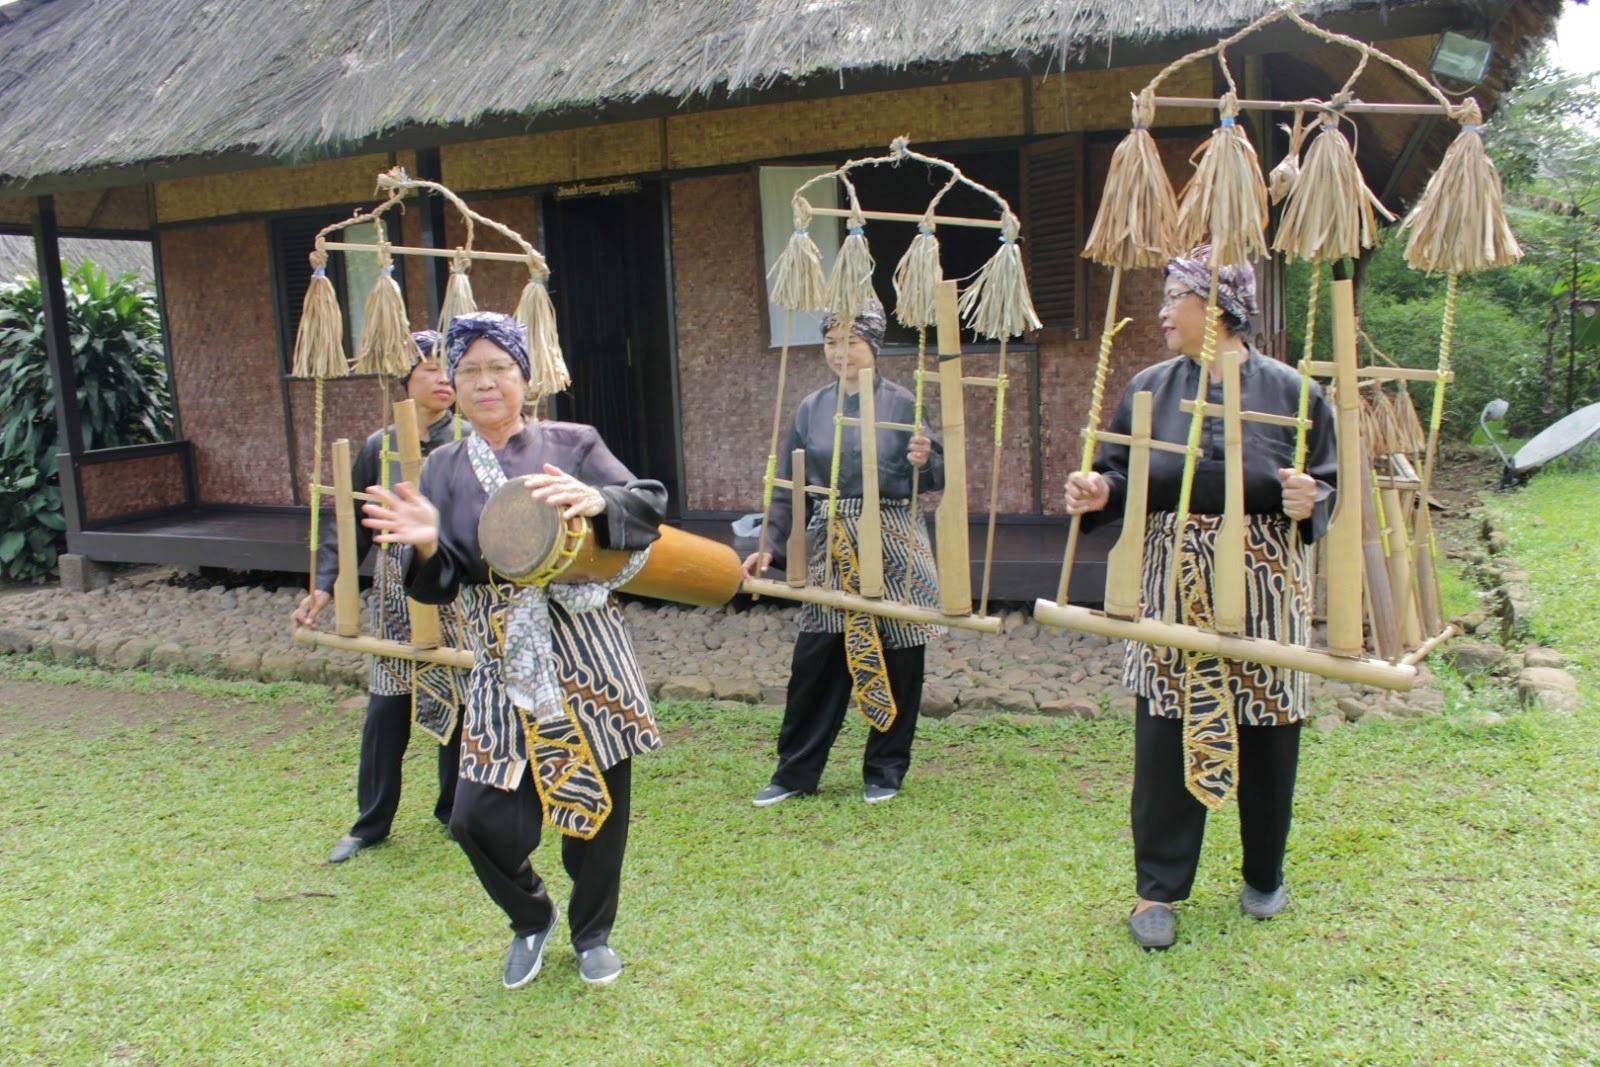 Upacara Seren Taun di Desa Pasir Eurih – Baranang Siang